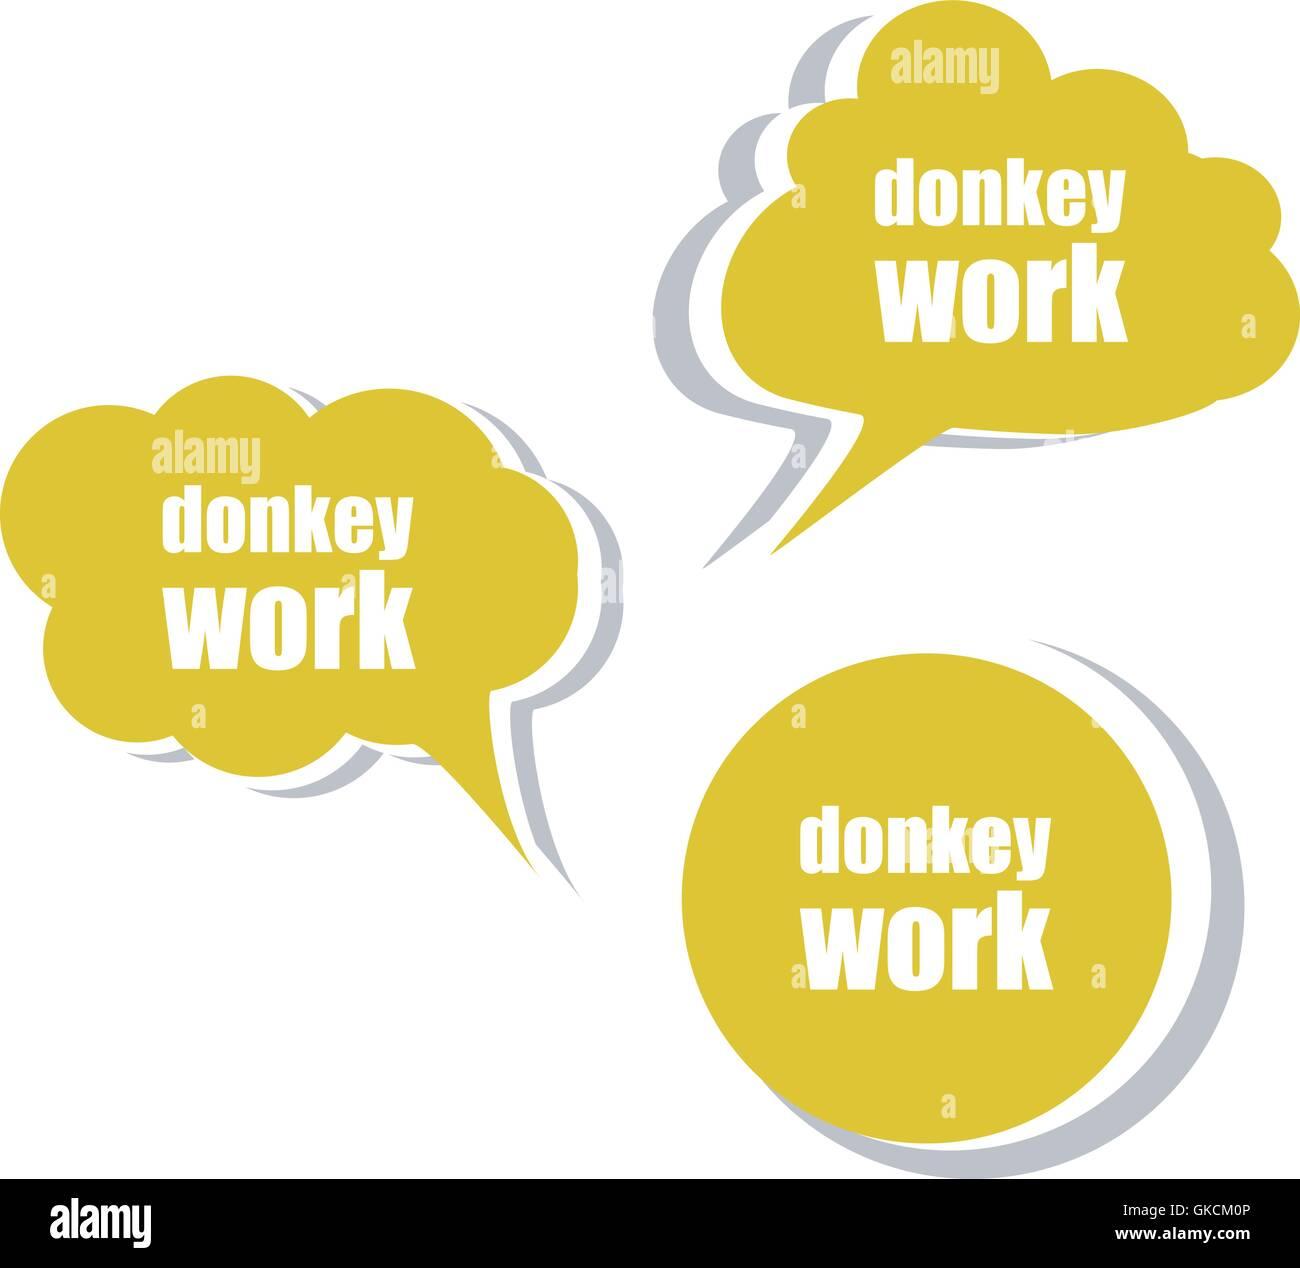 White Donkey Stock Vector Images - Alamy